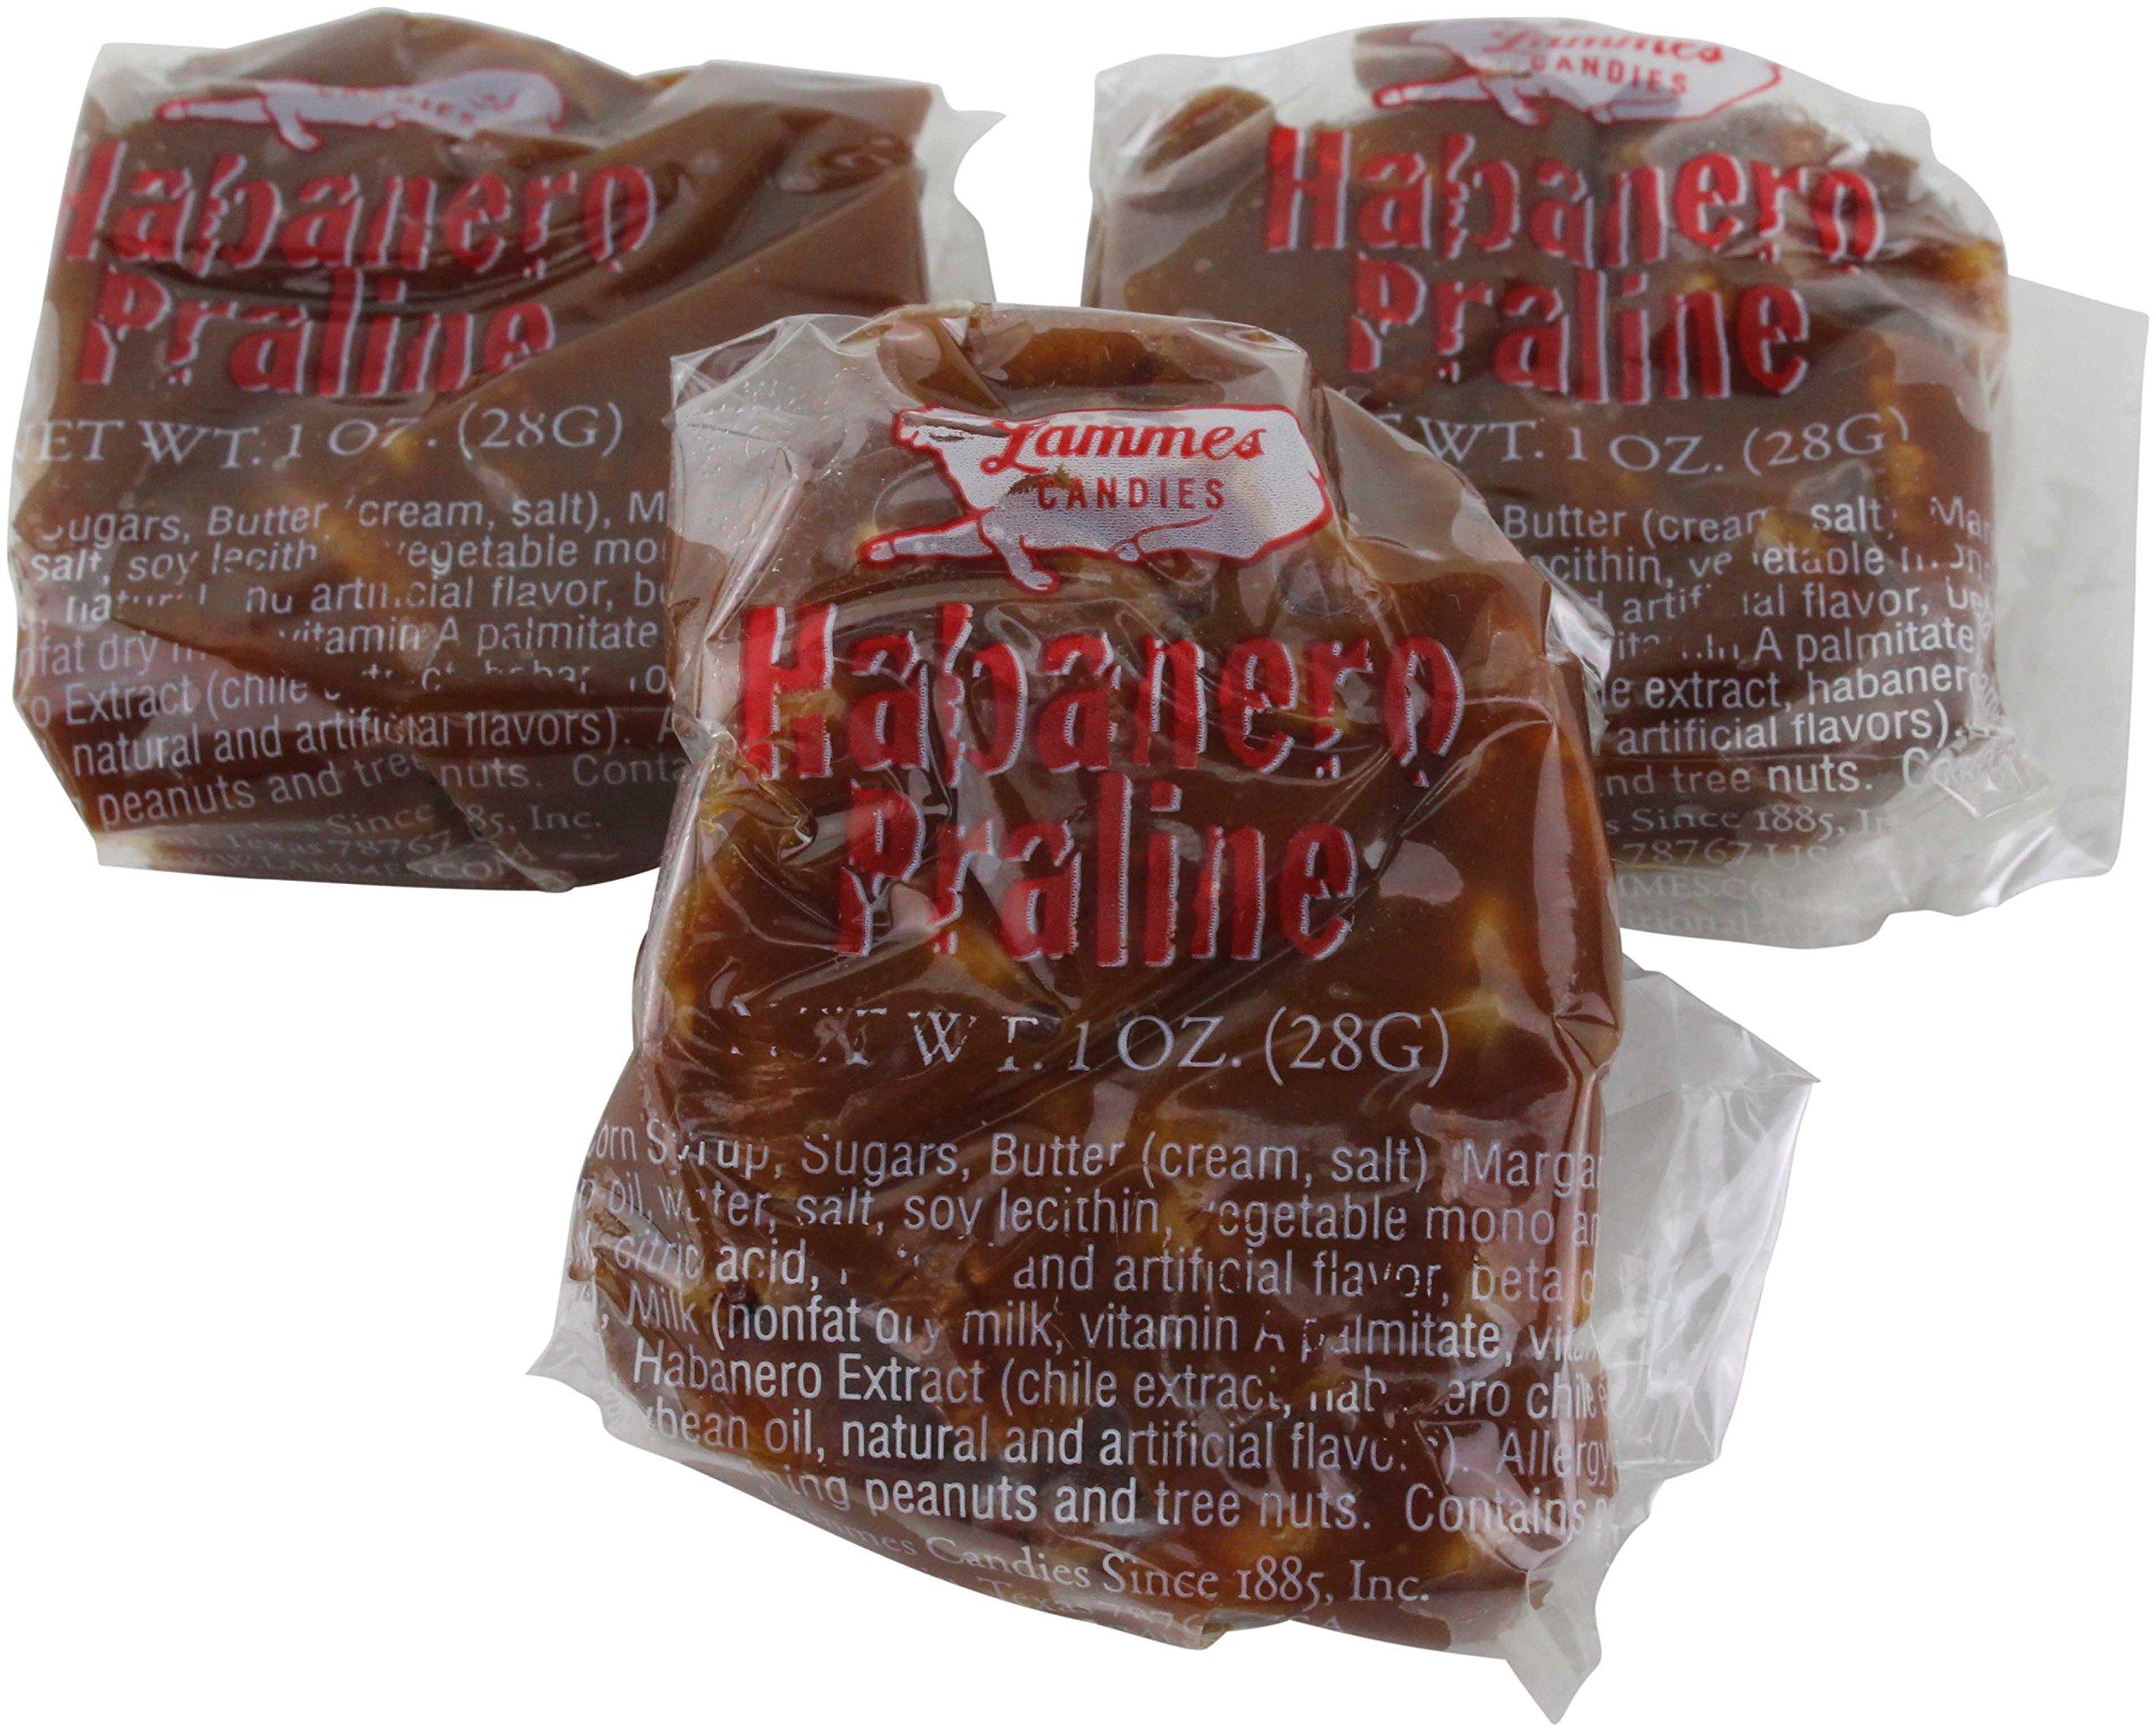 Lammes Candies Texas Chewie Habanero Pecan Pralines in Plain Box, 32 Oz by Lammes Candies